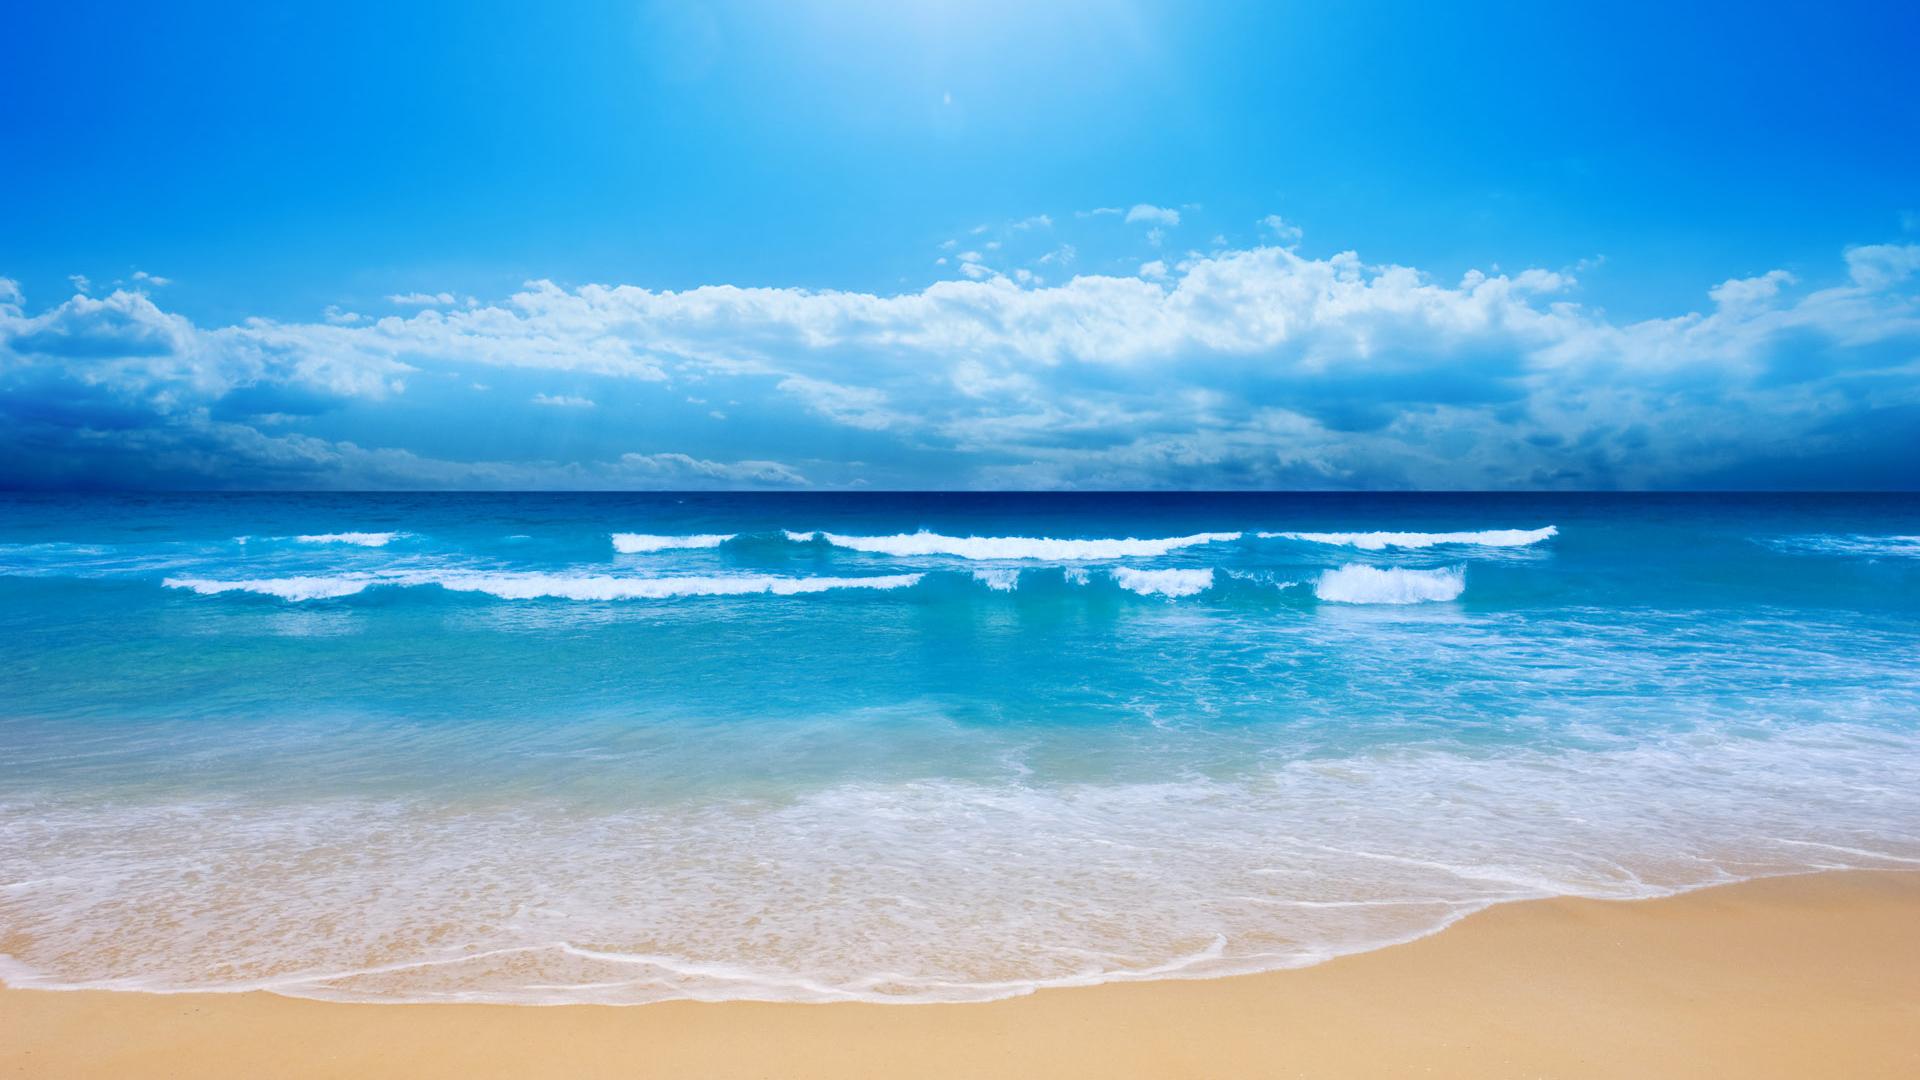 19201080 Blue Waves Beach Wallpaper[1080p HD] 1920x1080